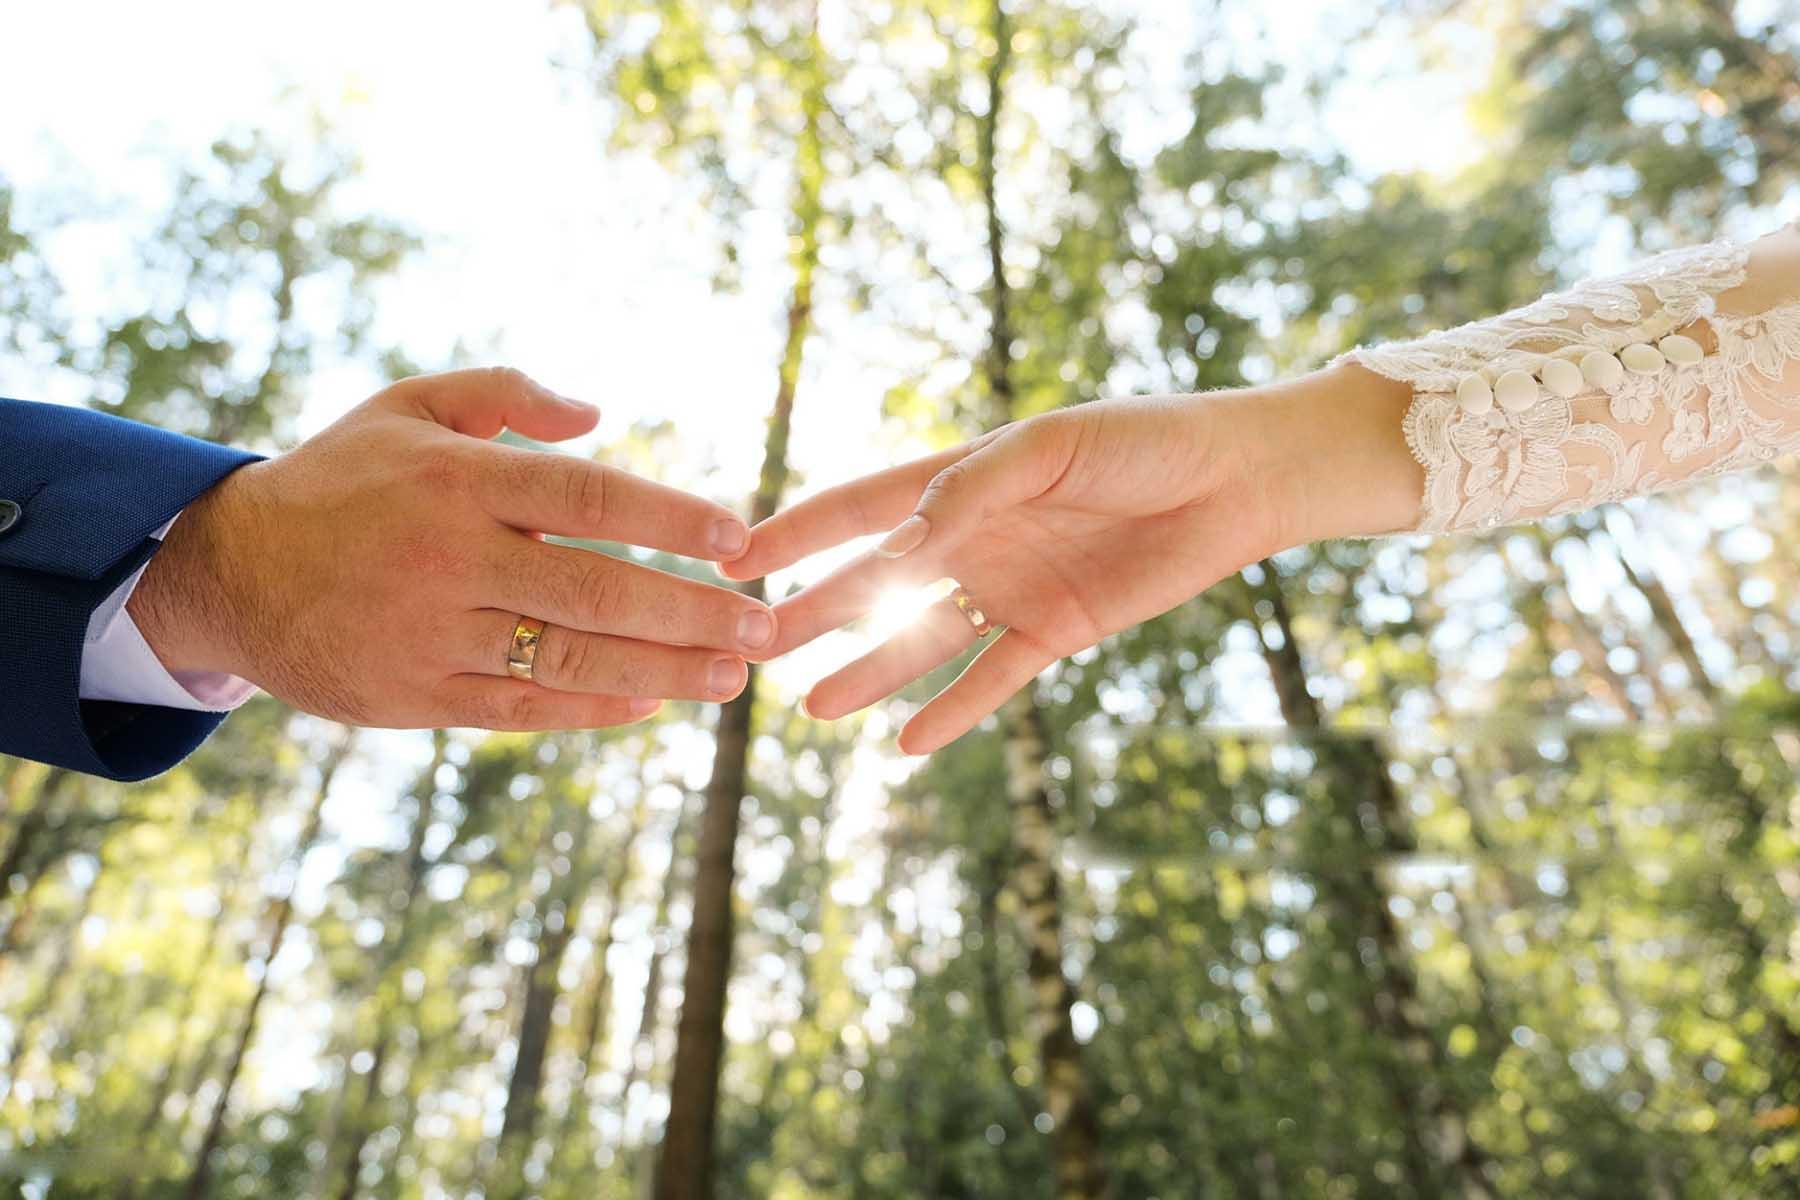 علائم بلوغ اجتماعی در ازدواج